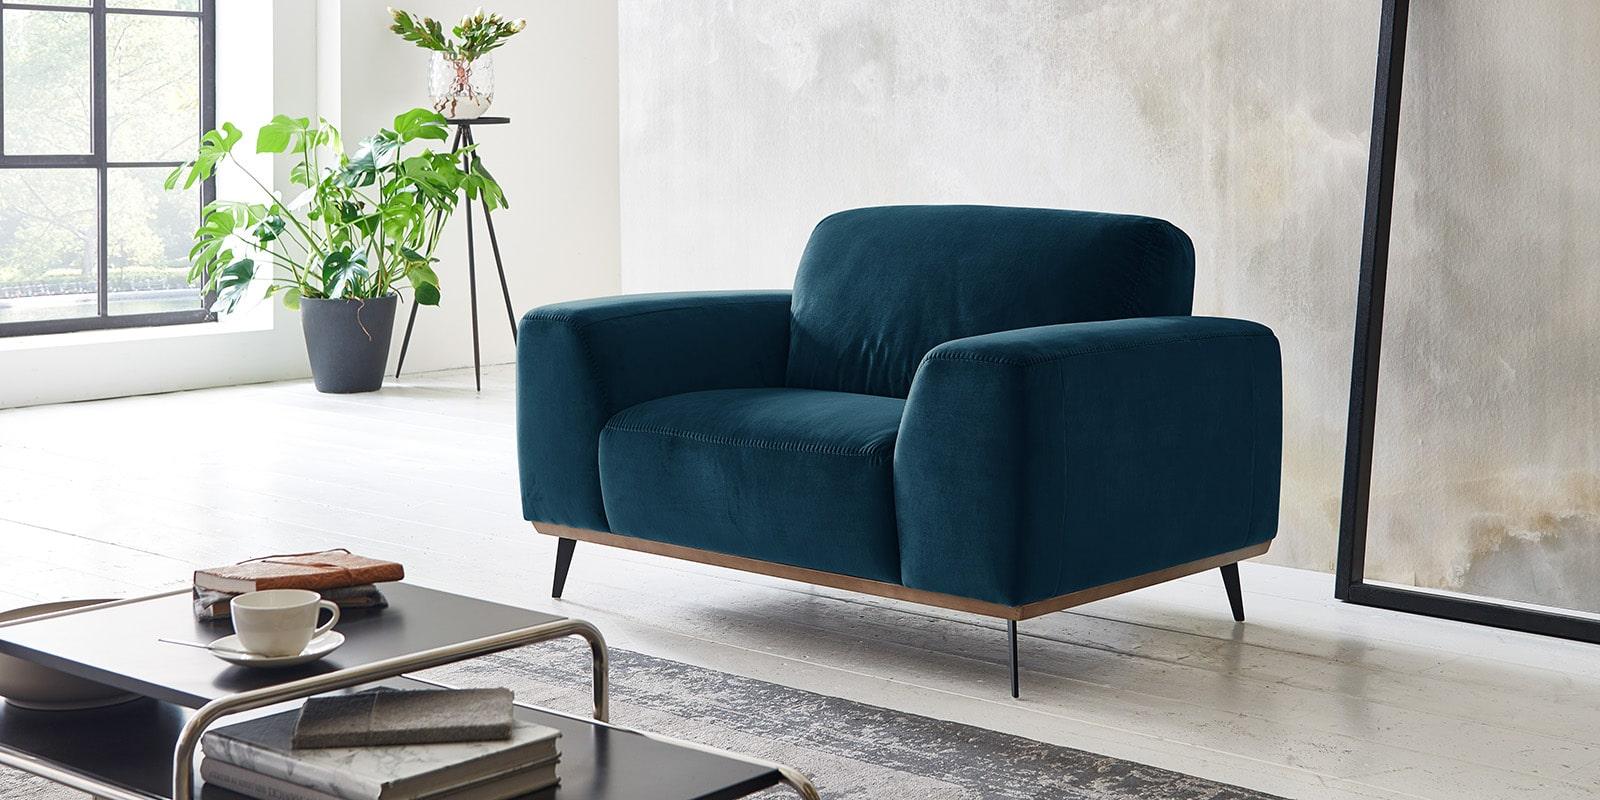 Moebella24 - 1-Sitzer - Sofa - Sessel - Barcelona - Samt - Türkis - Skandinavisches - Design - Punto - cavallo - Nähte